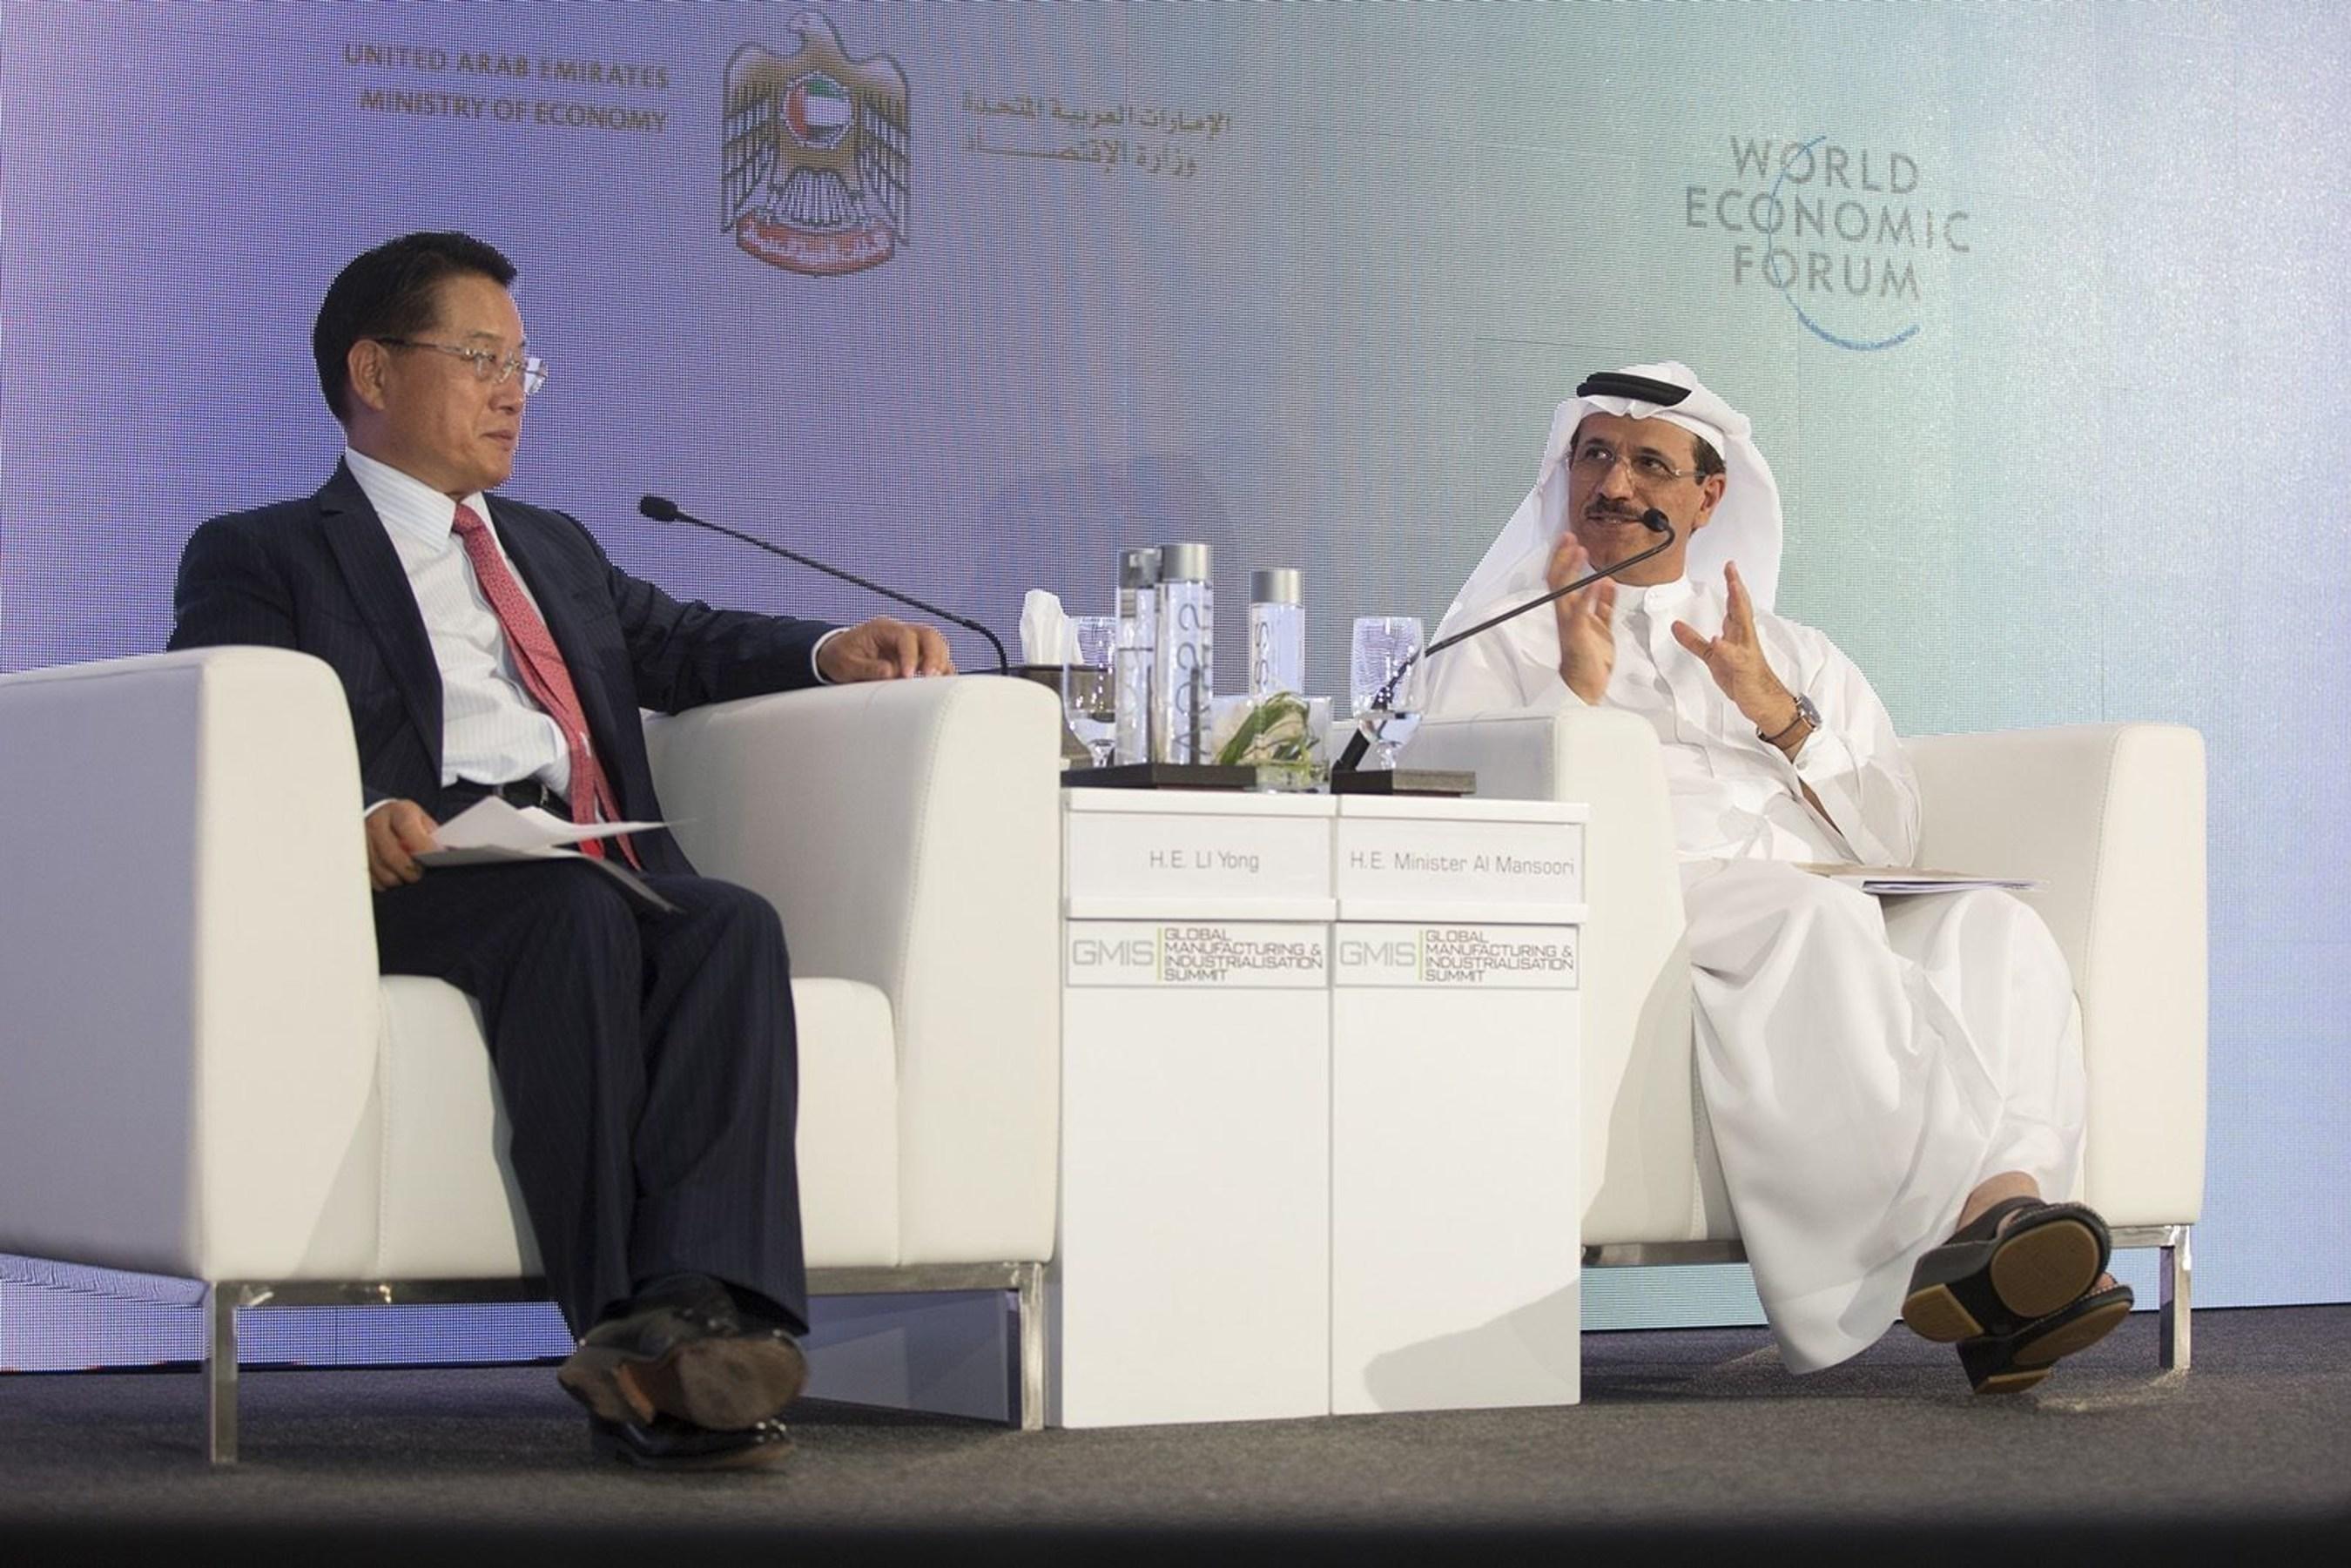 HE Li Young - Director General of UNIDO and HE Sultan Bin Saeed Al Mansoori- Minister of Economy (PRNewsFoto/GMIS) (PRNewsFoto/GMIS)